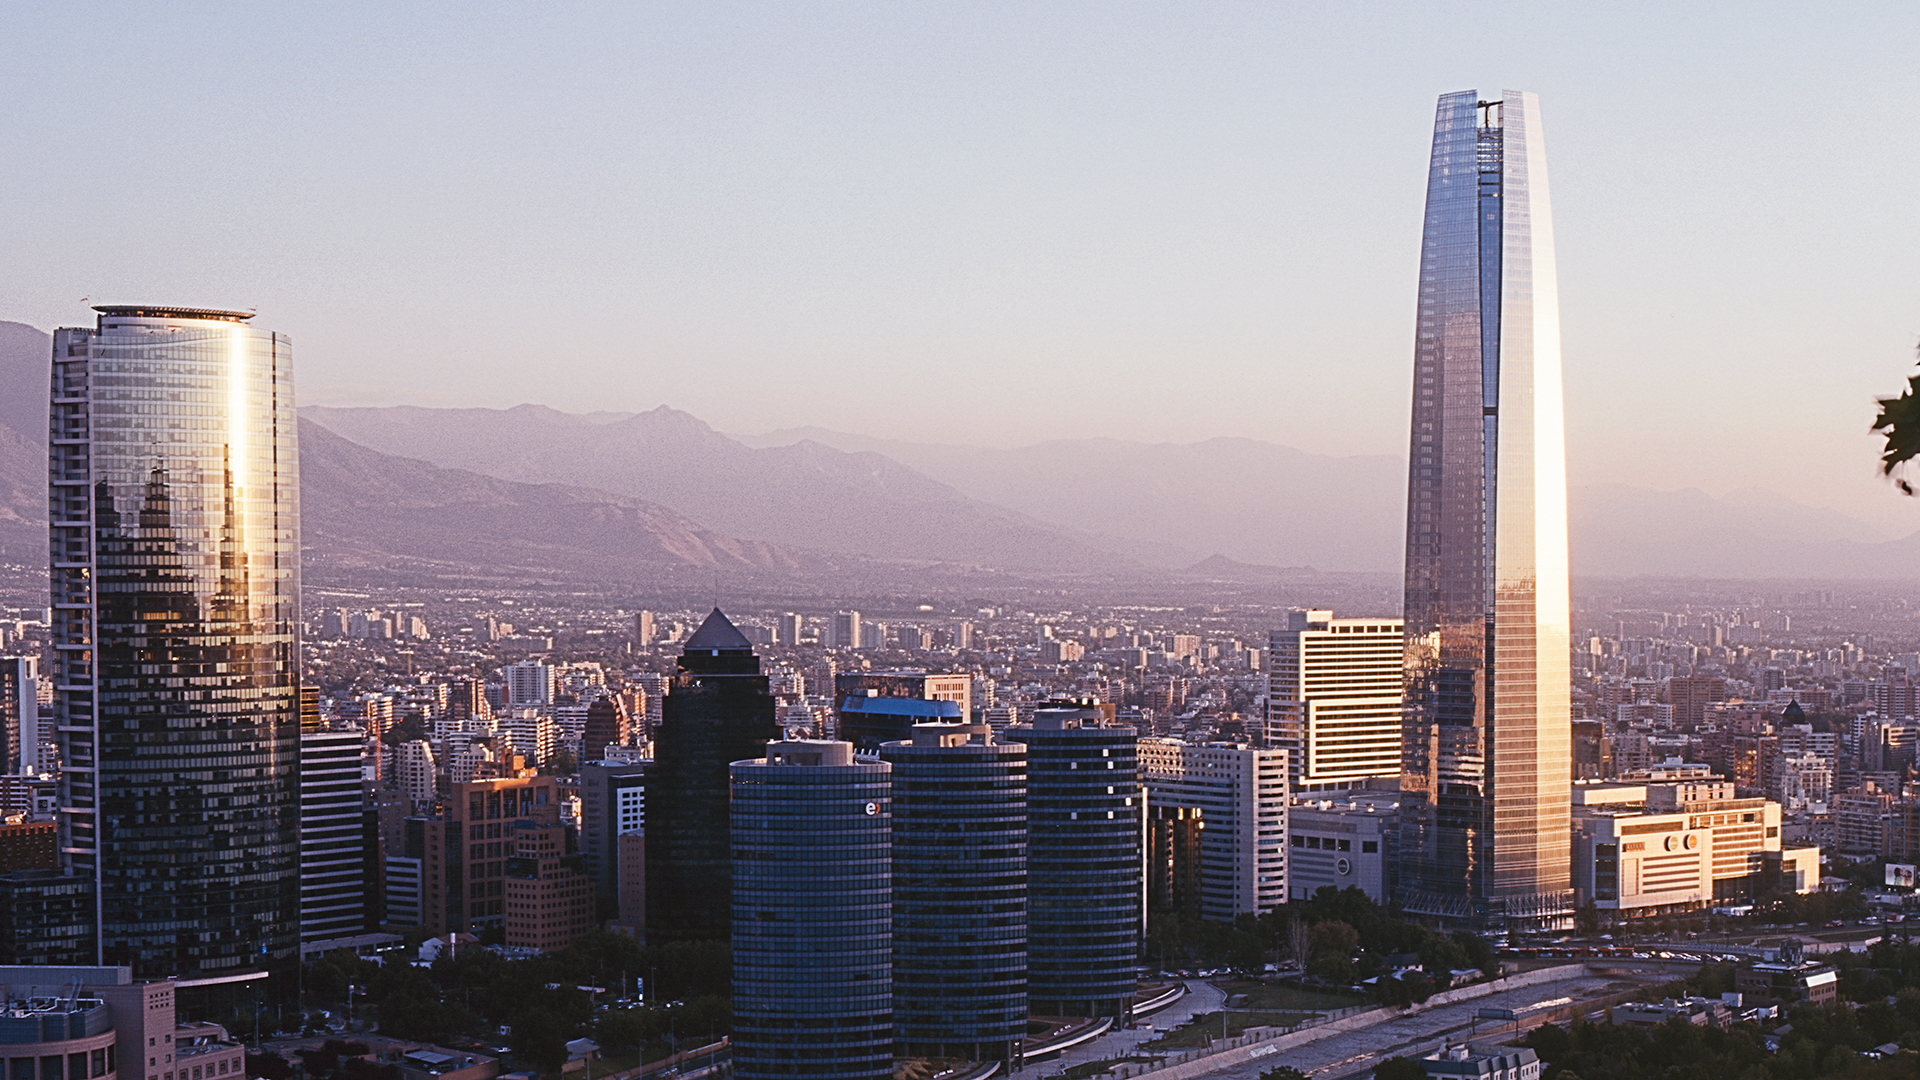 Cerro San Cristobal 03.jpg